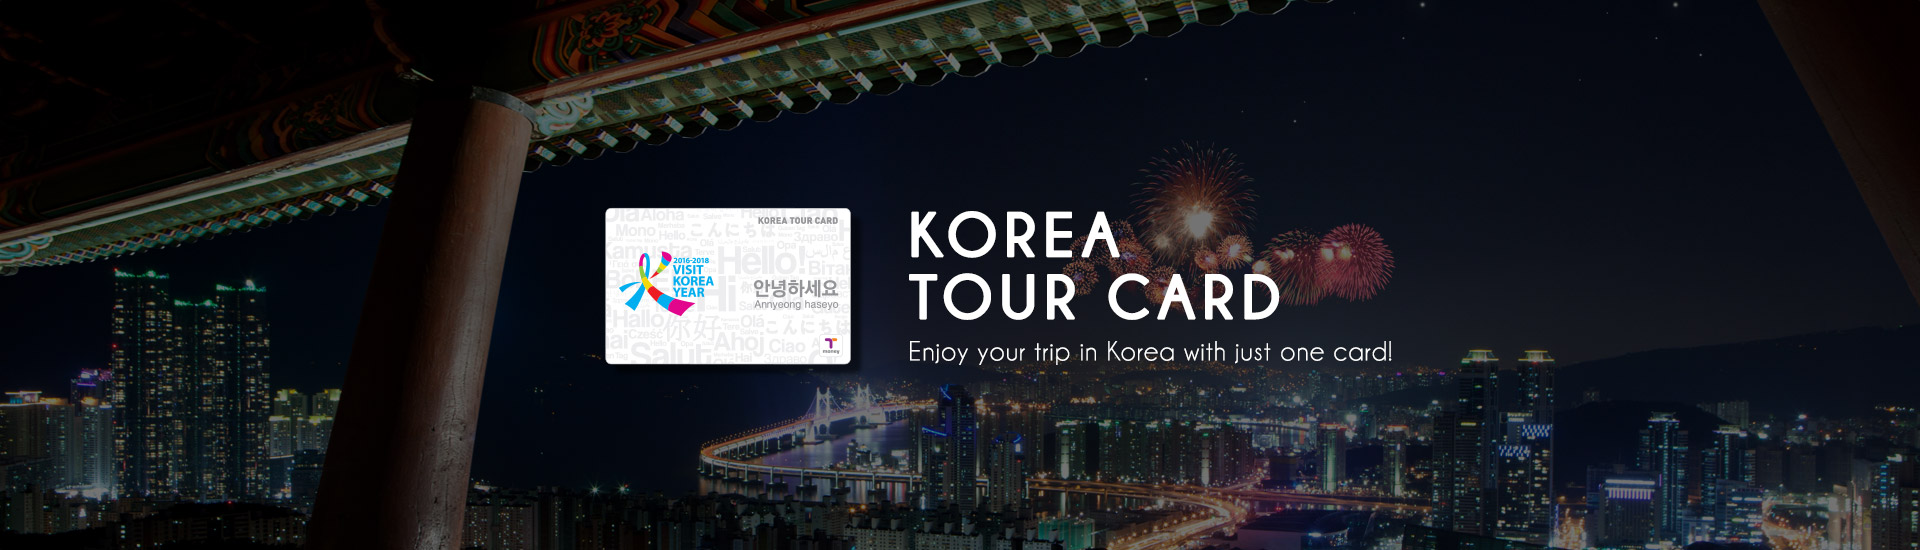 KOREA TOUR CARD